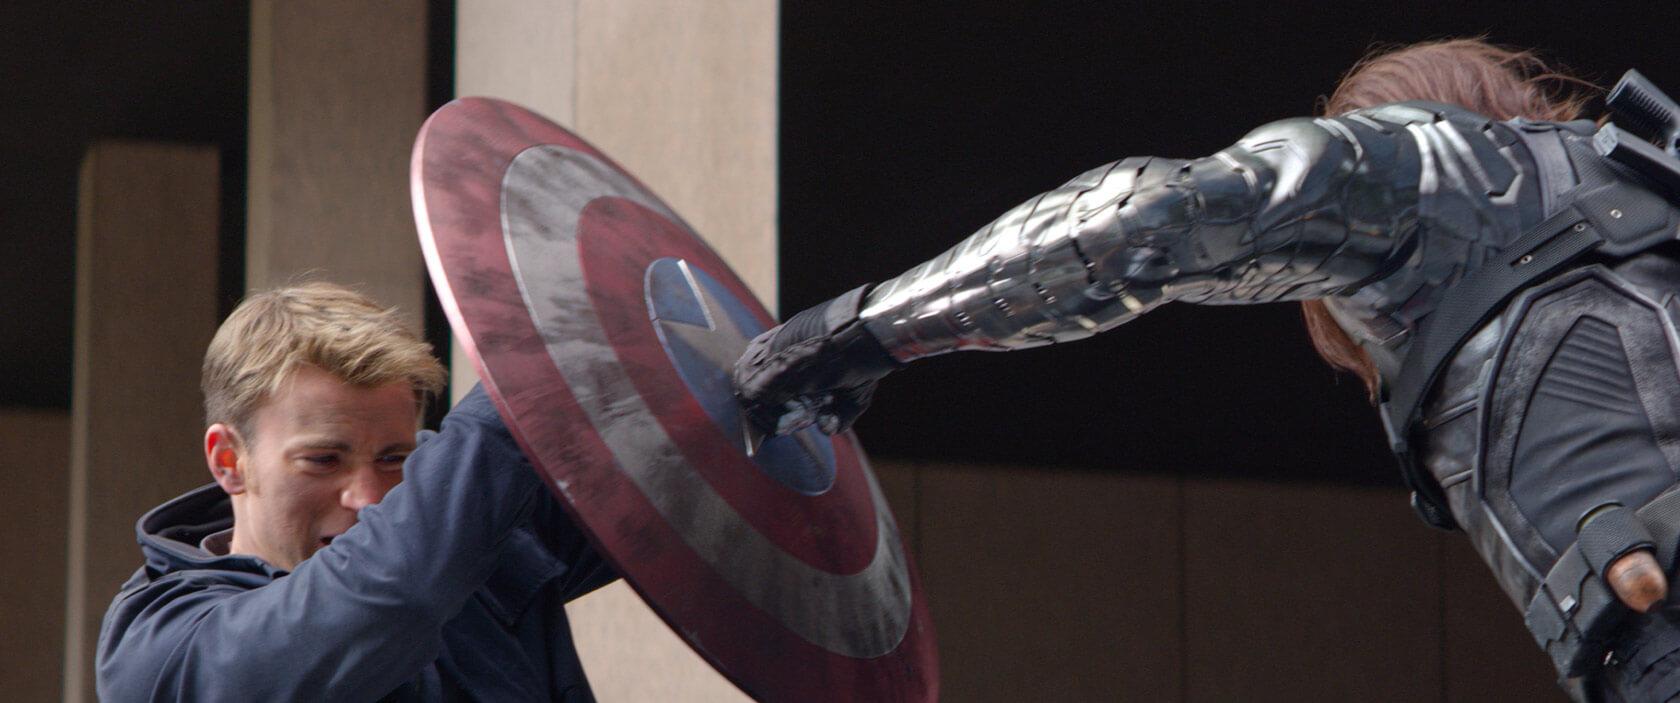 captian-america-the-winter-soldier-2014-movie-marvel